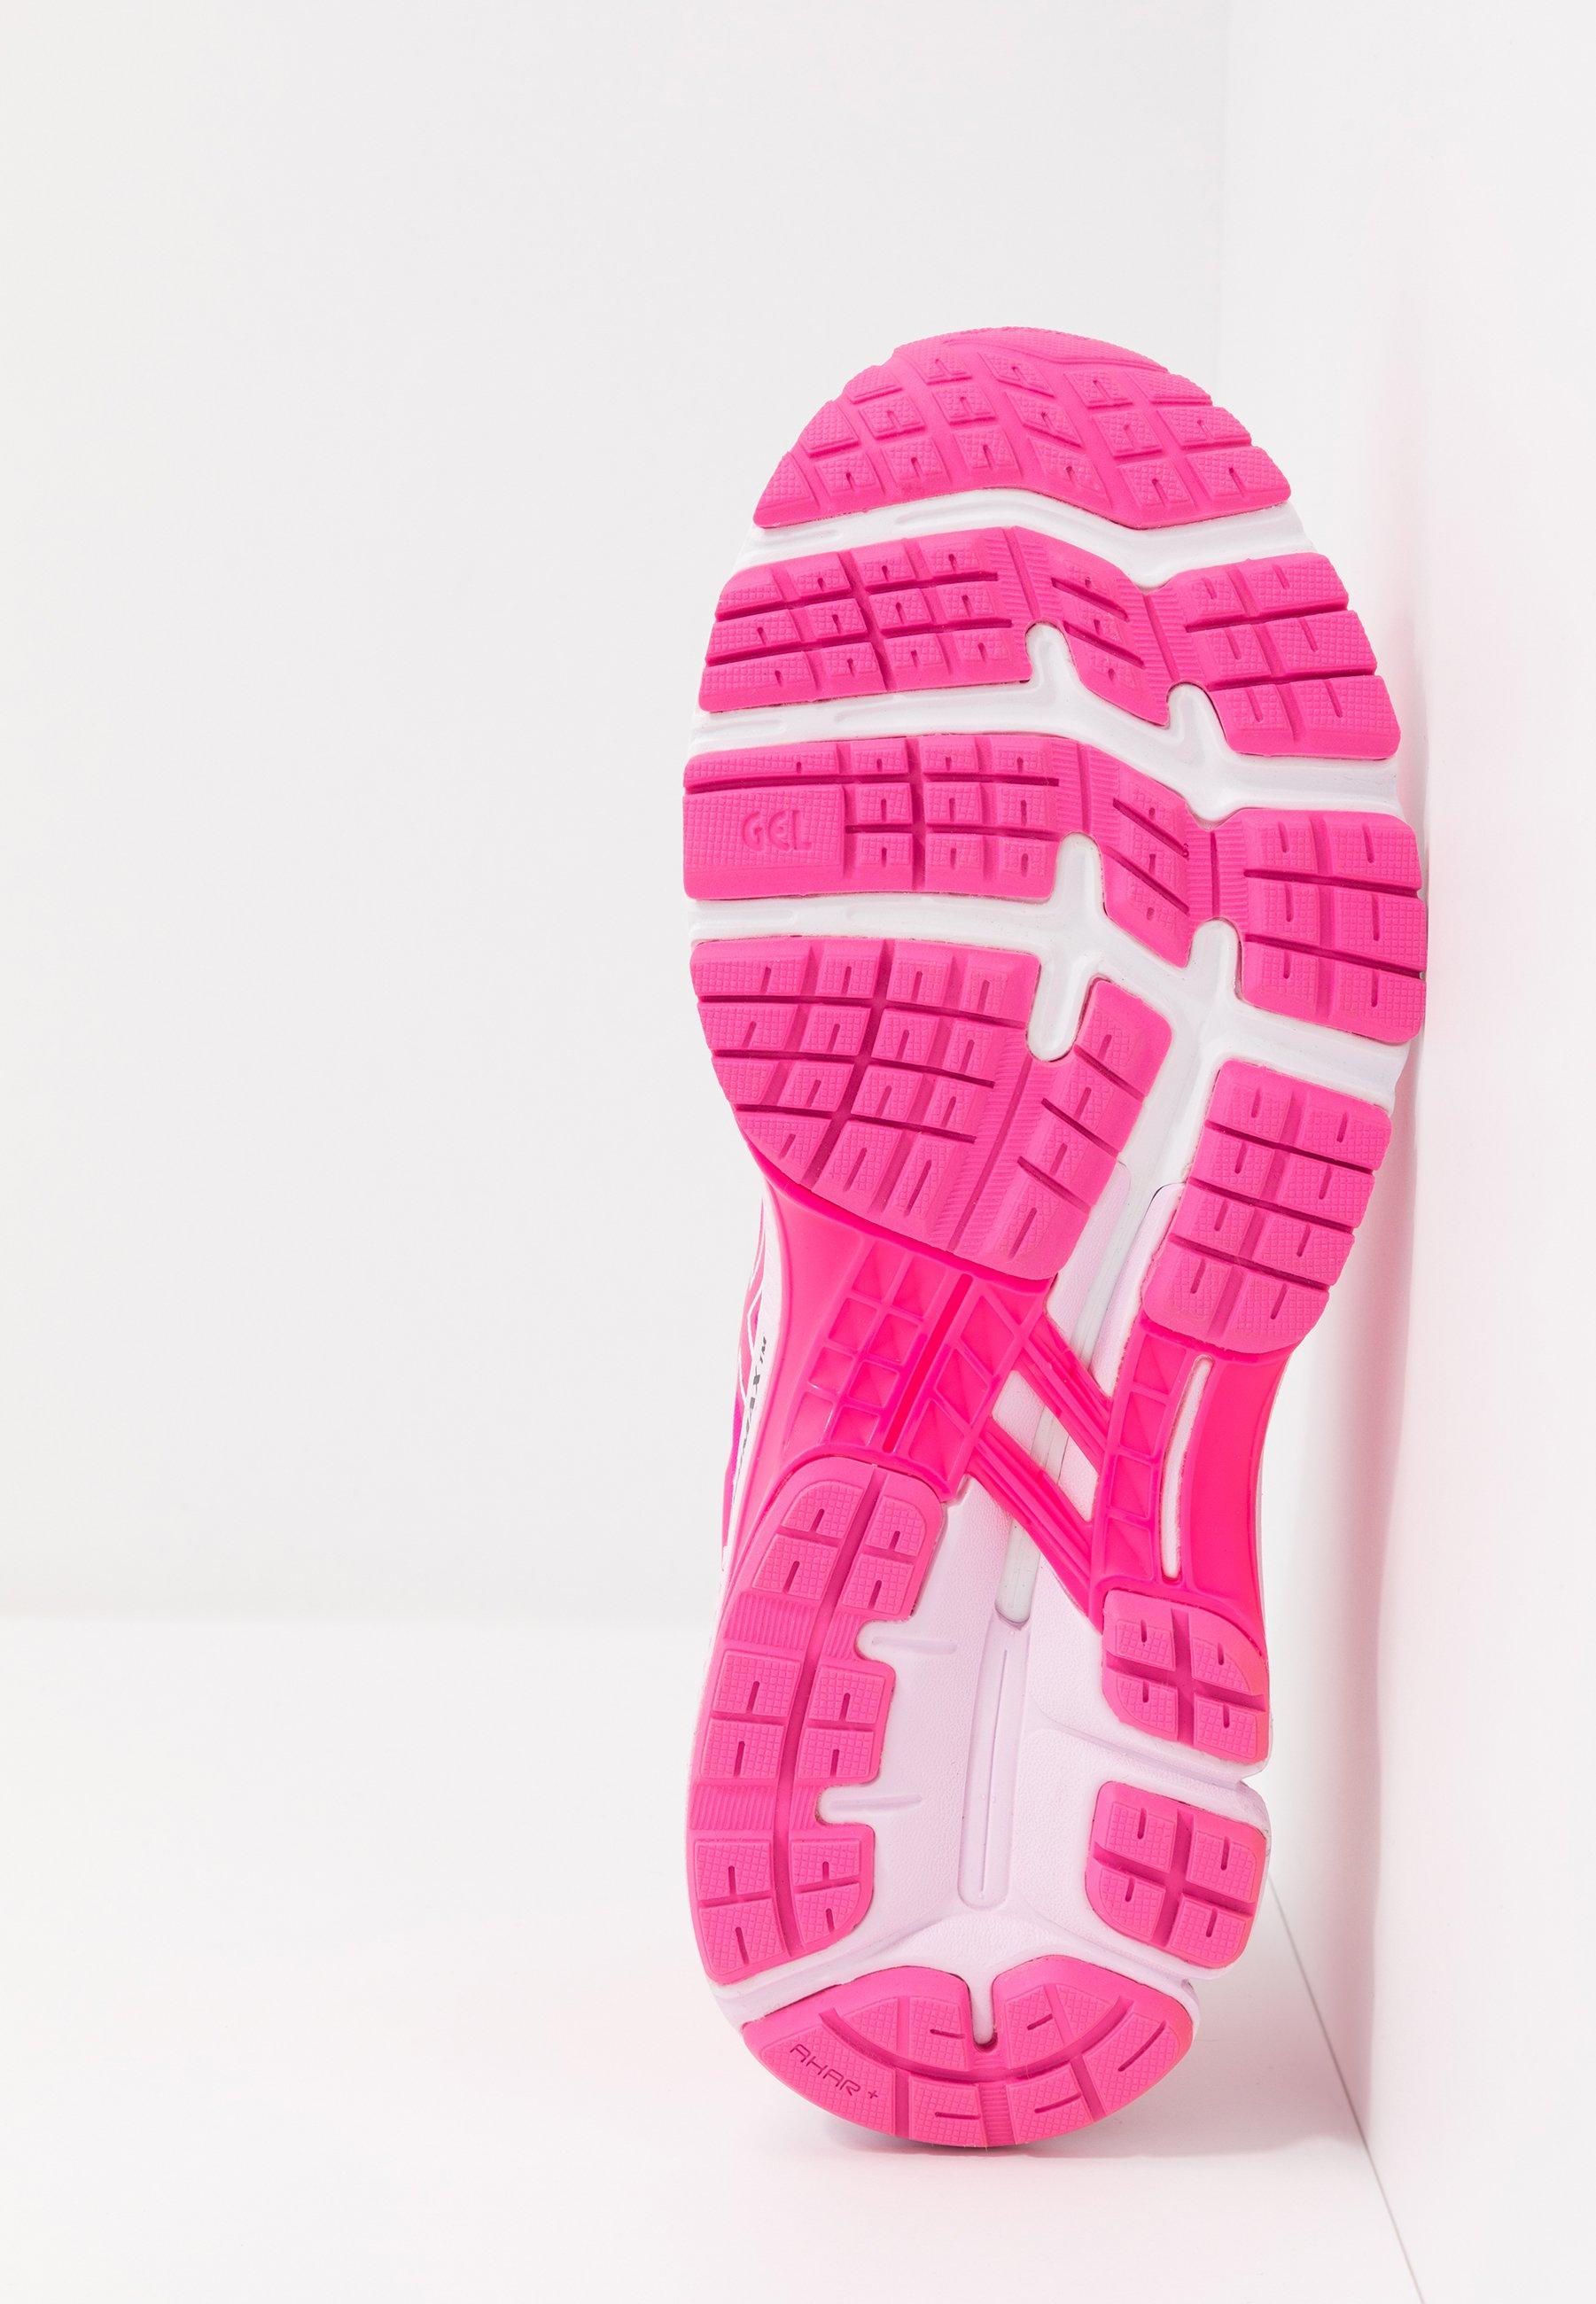 Asics Gel-kayano 26 - Löparskor Stabilitet Pink Glo/cotton Candy